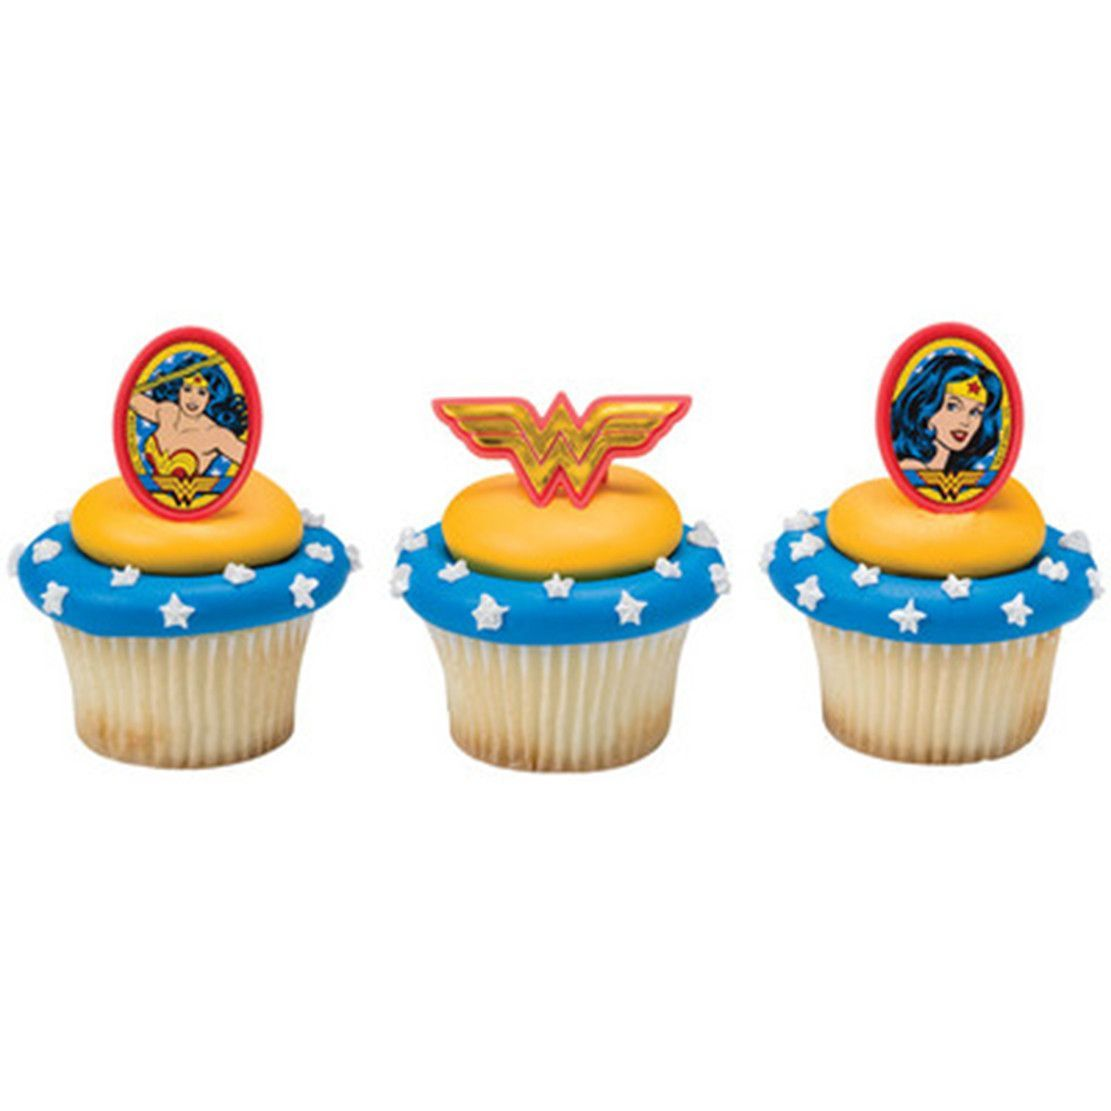 22 wonder woman amazing amazon cupcake topper rings